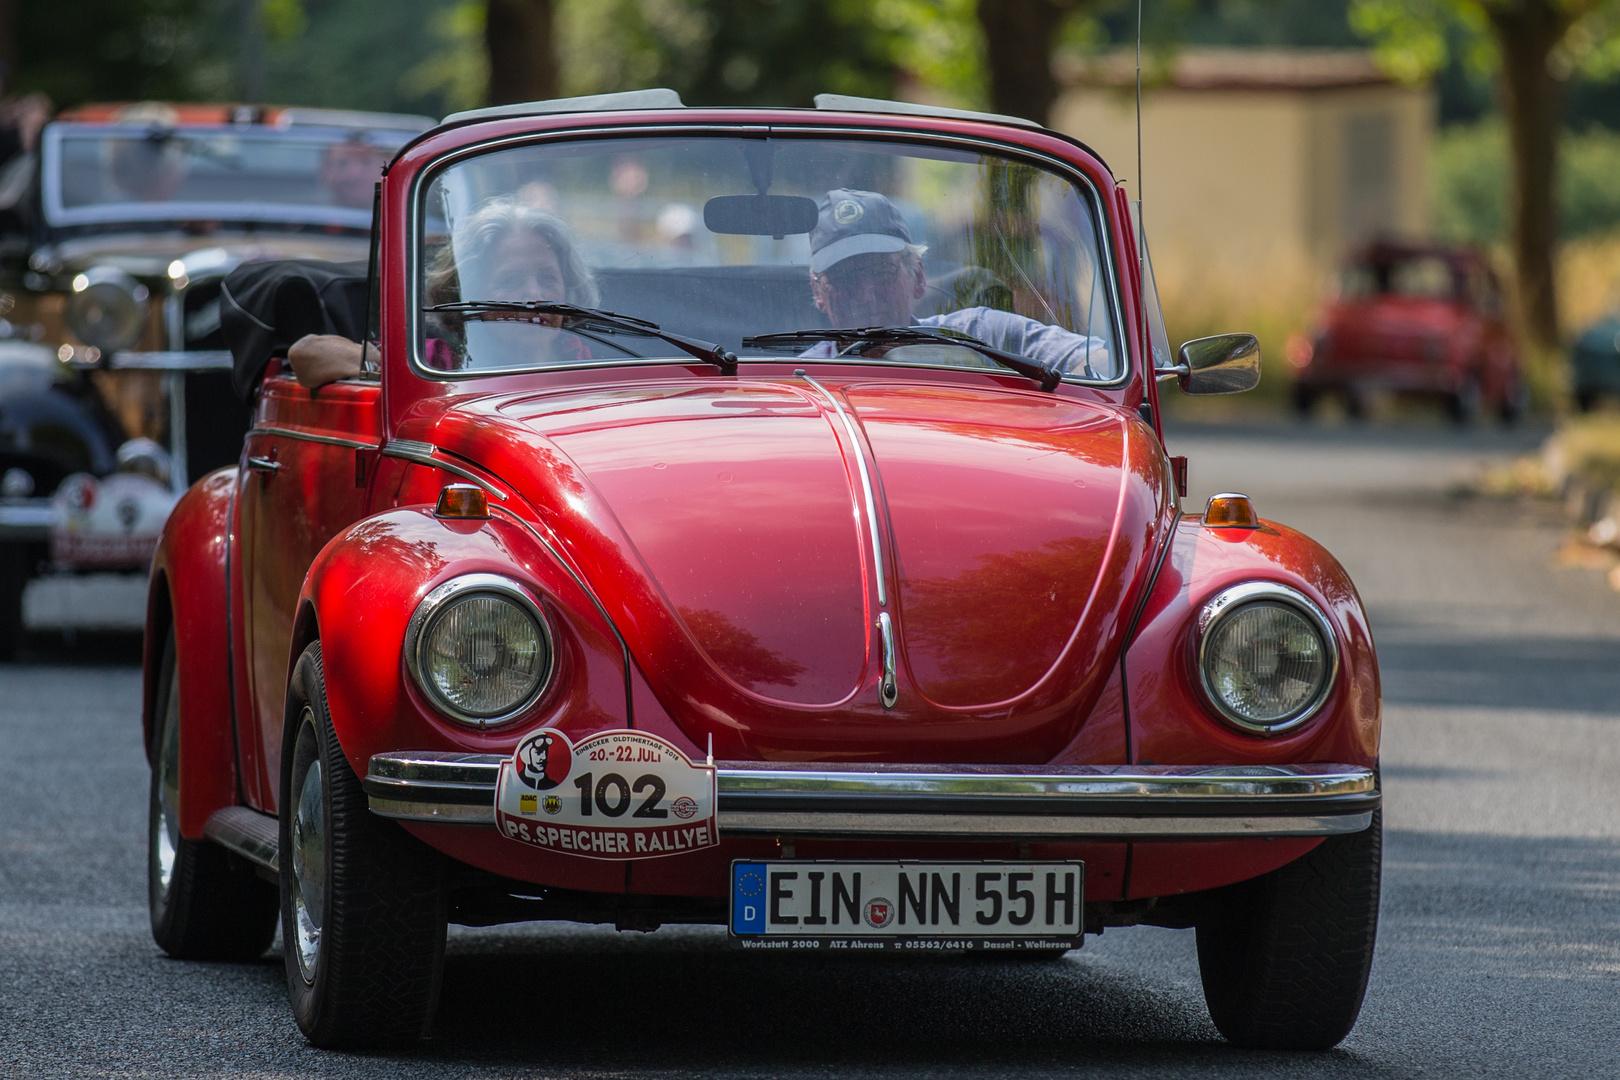 vw käfer cabrio foto  bild  reportage dokumentation